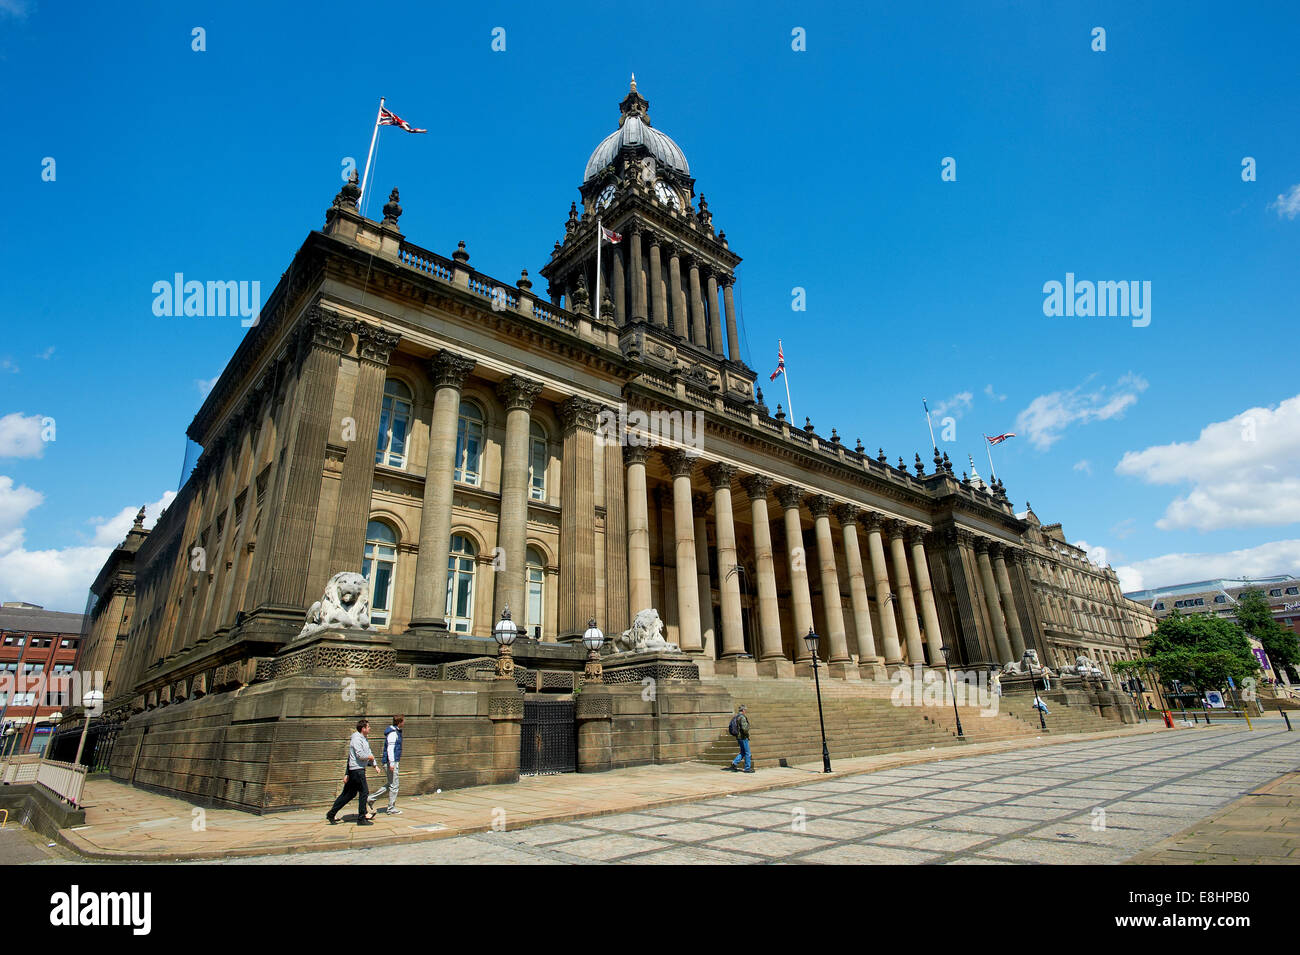 Leeds Town Hall, Leeds, West Yorkshire, UK. - Stock Image